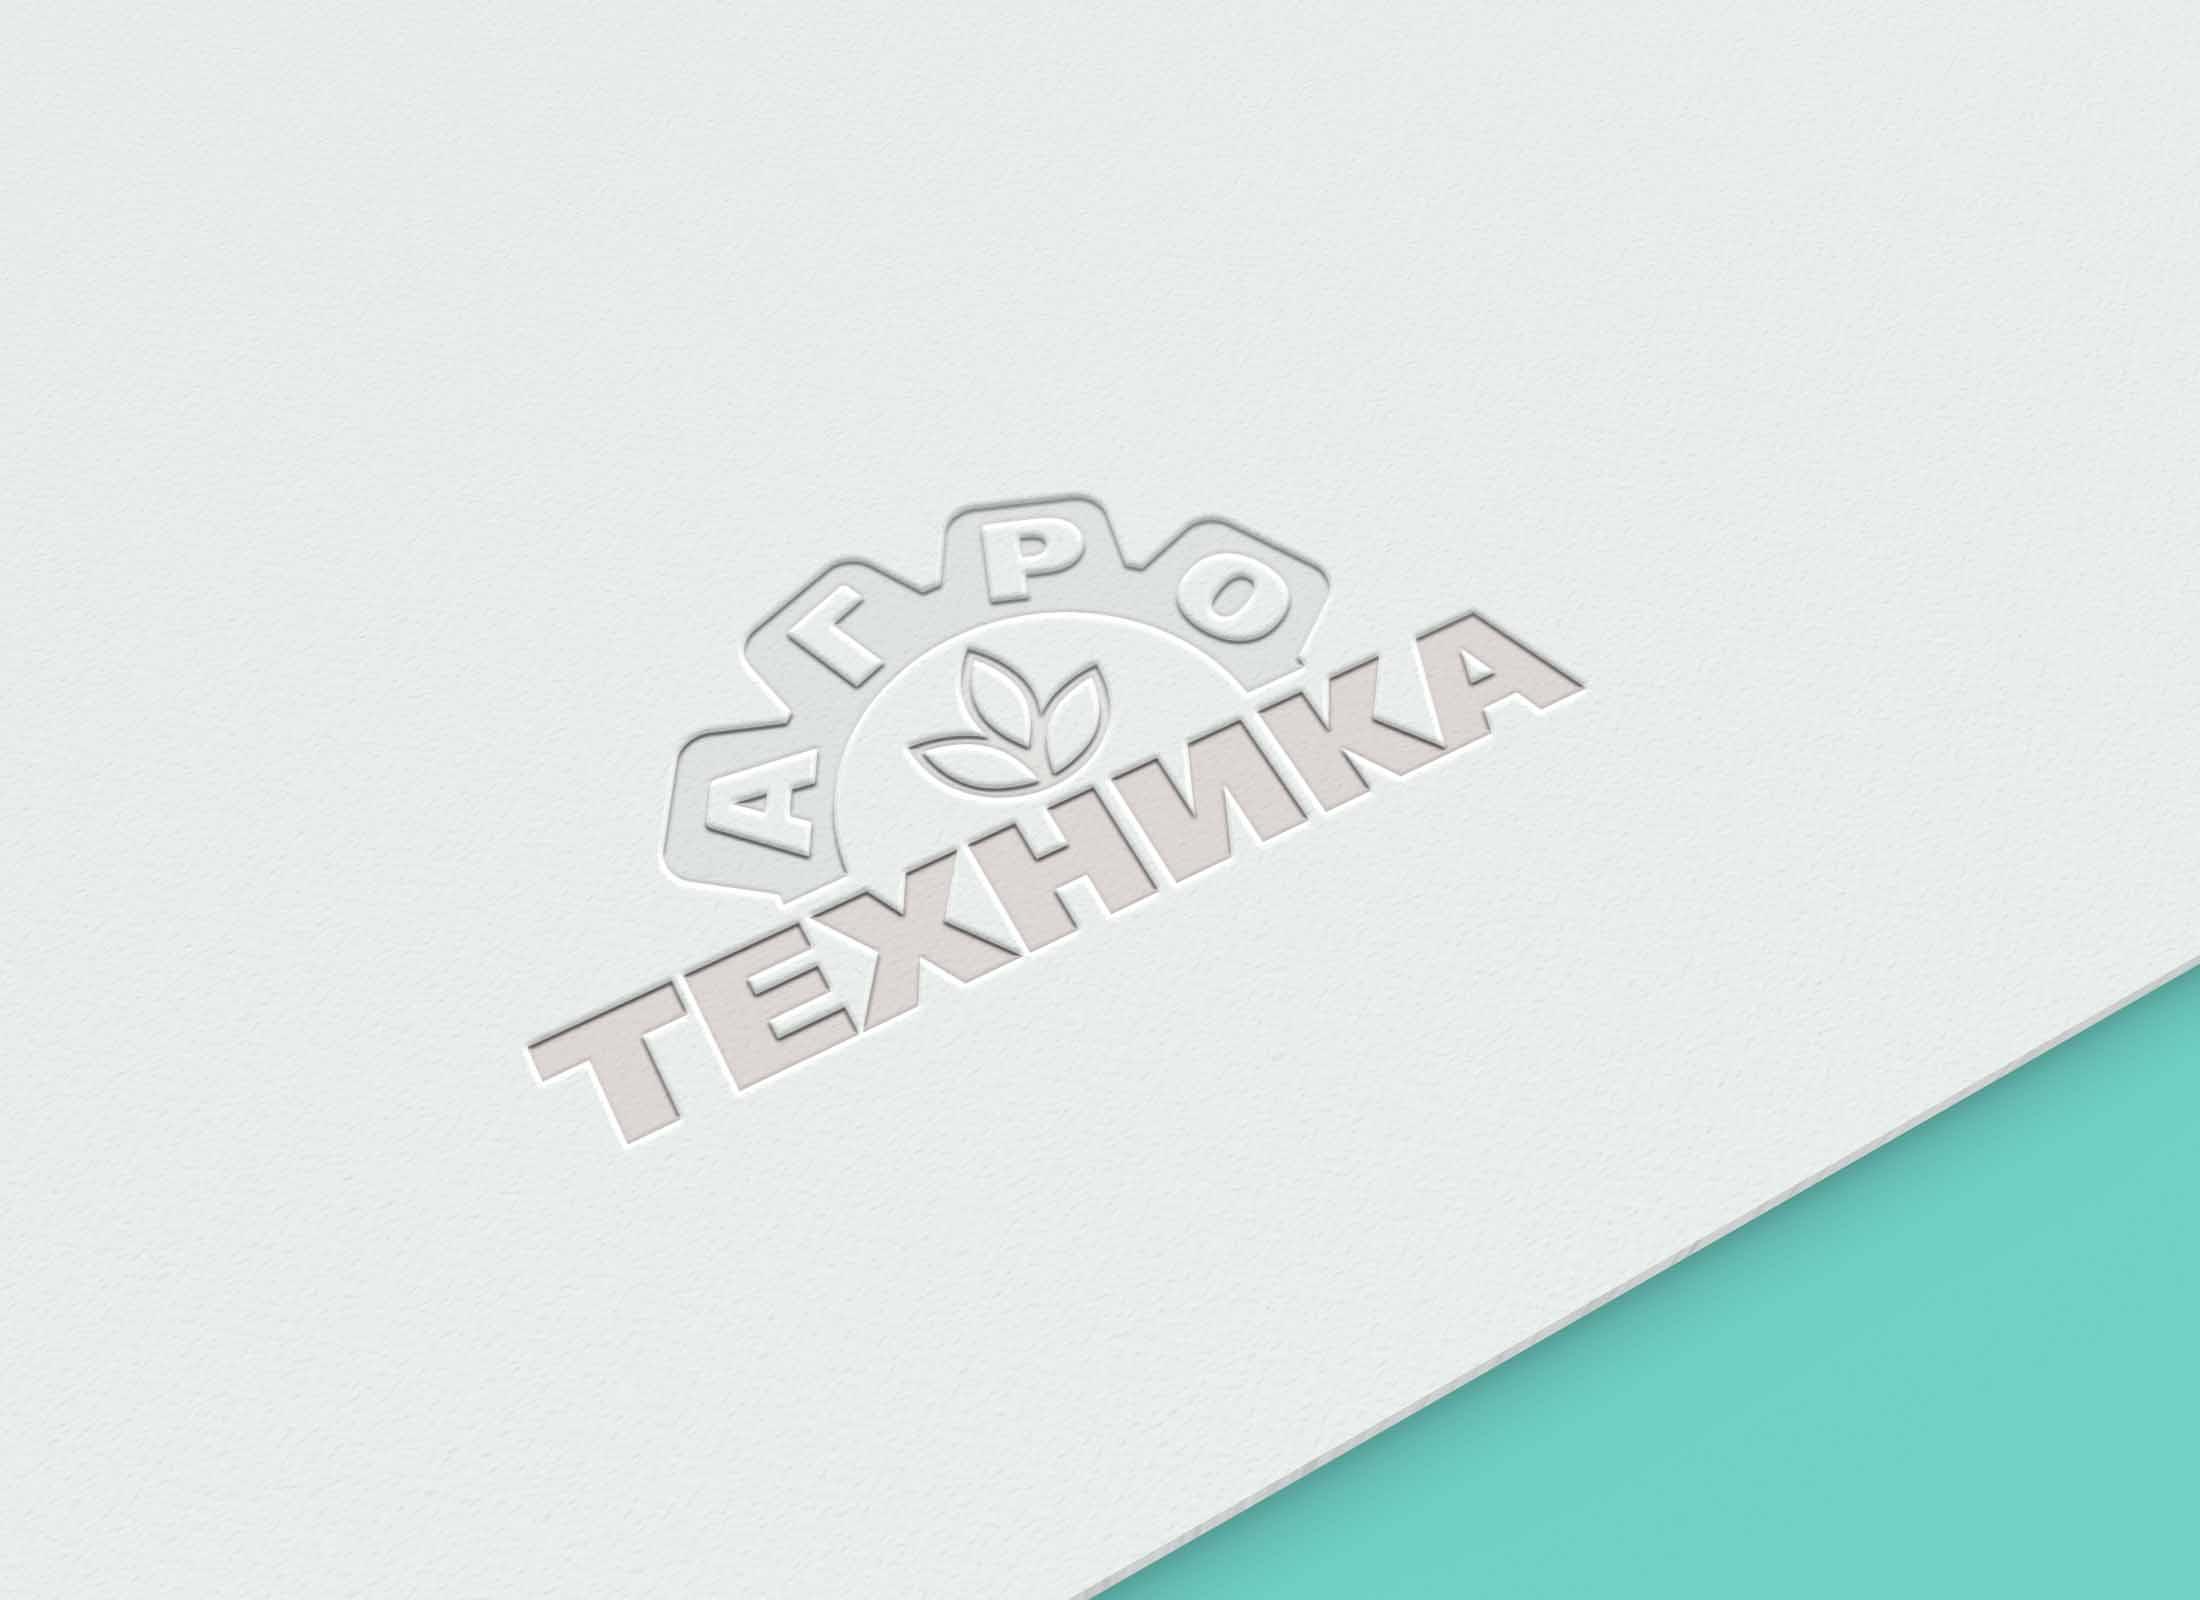 Разработка логотипа для компании Агротехника фото f_4165c012875706d0.jpg